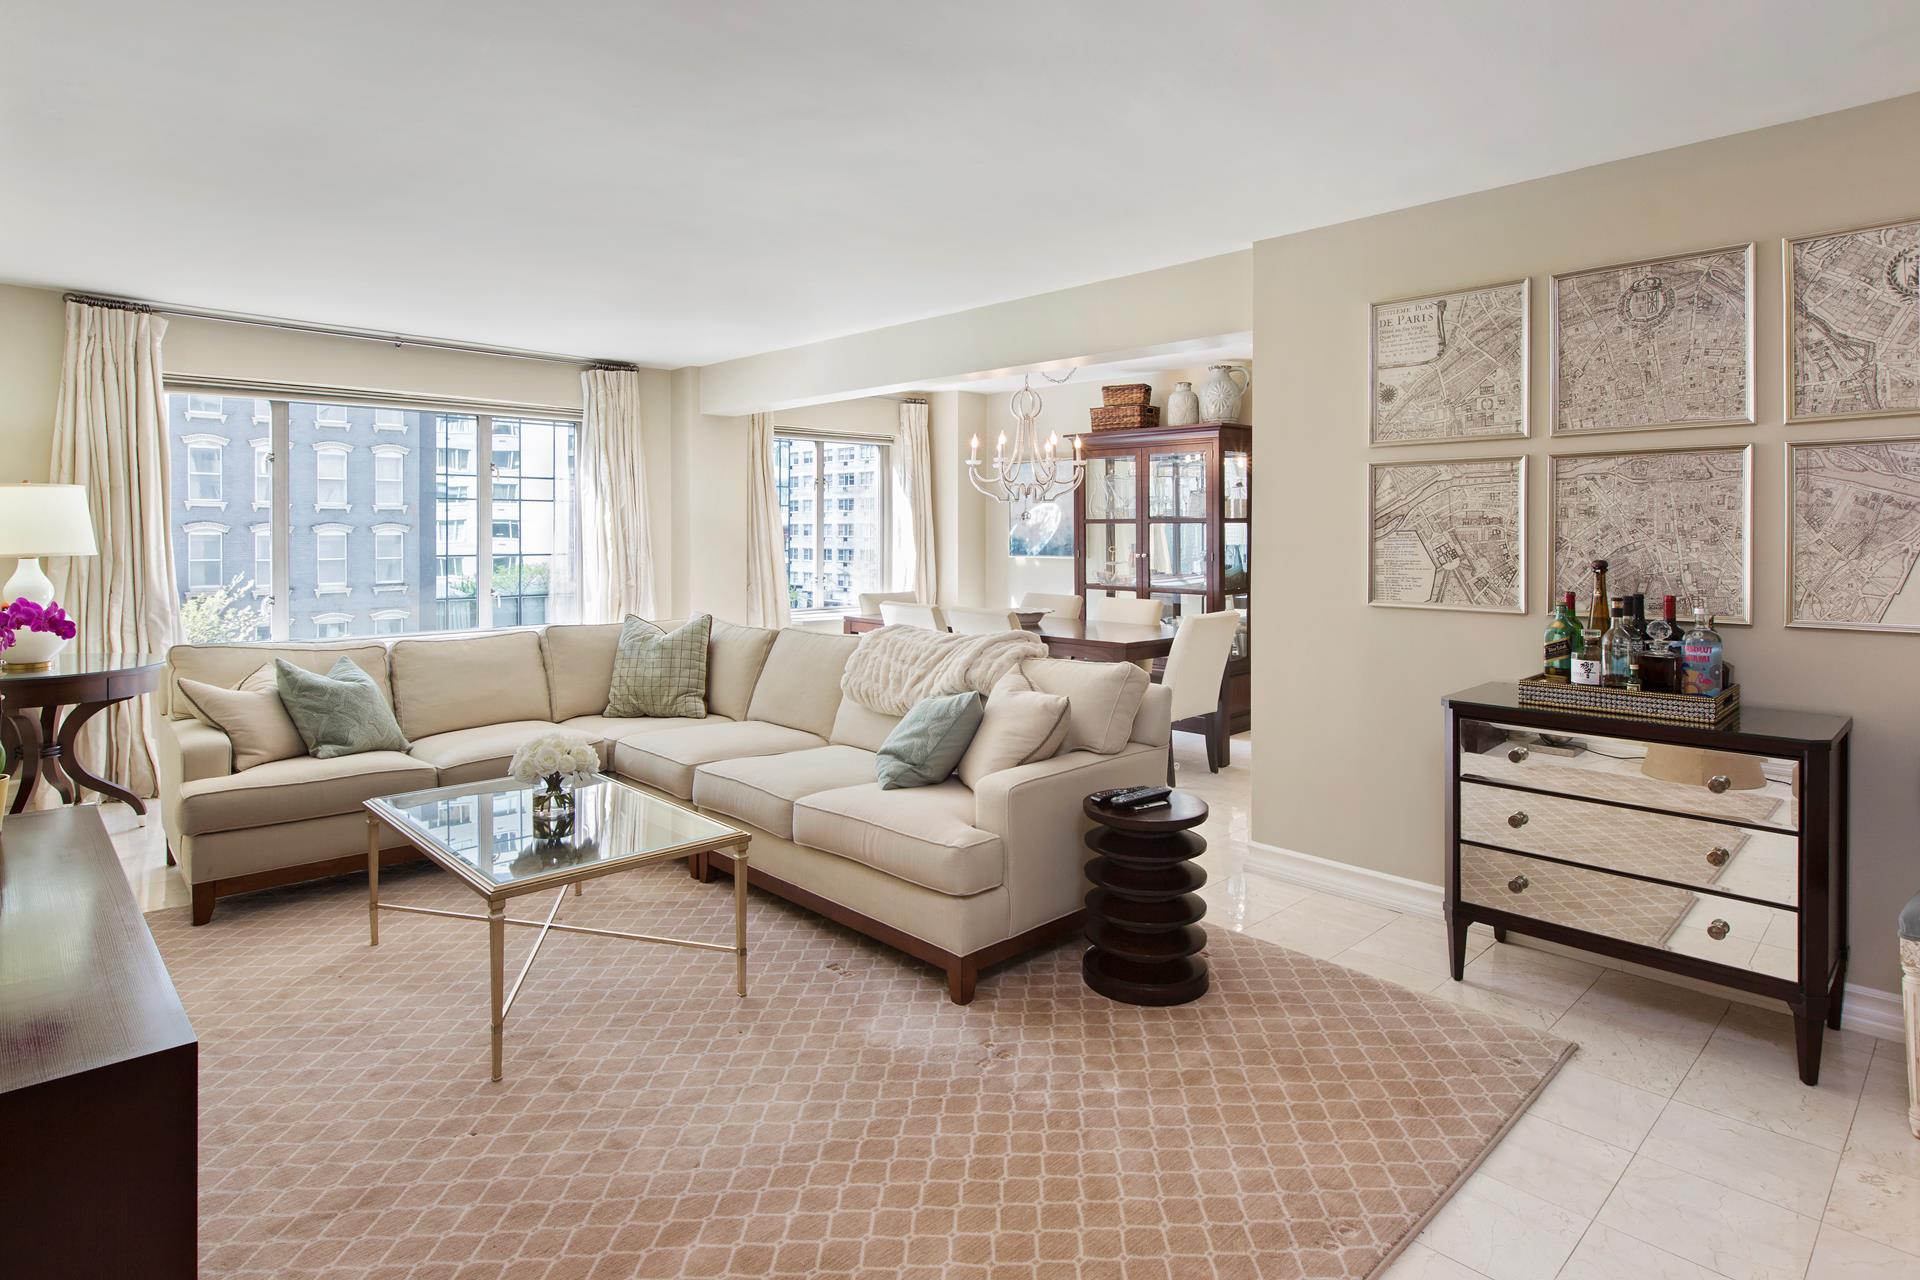 Property Listings| Oren Alexander | Alexander Team | New